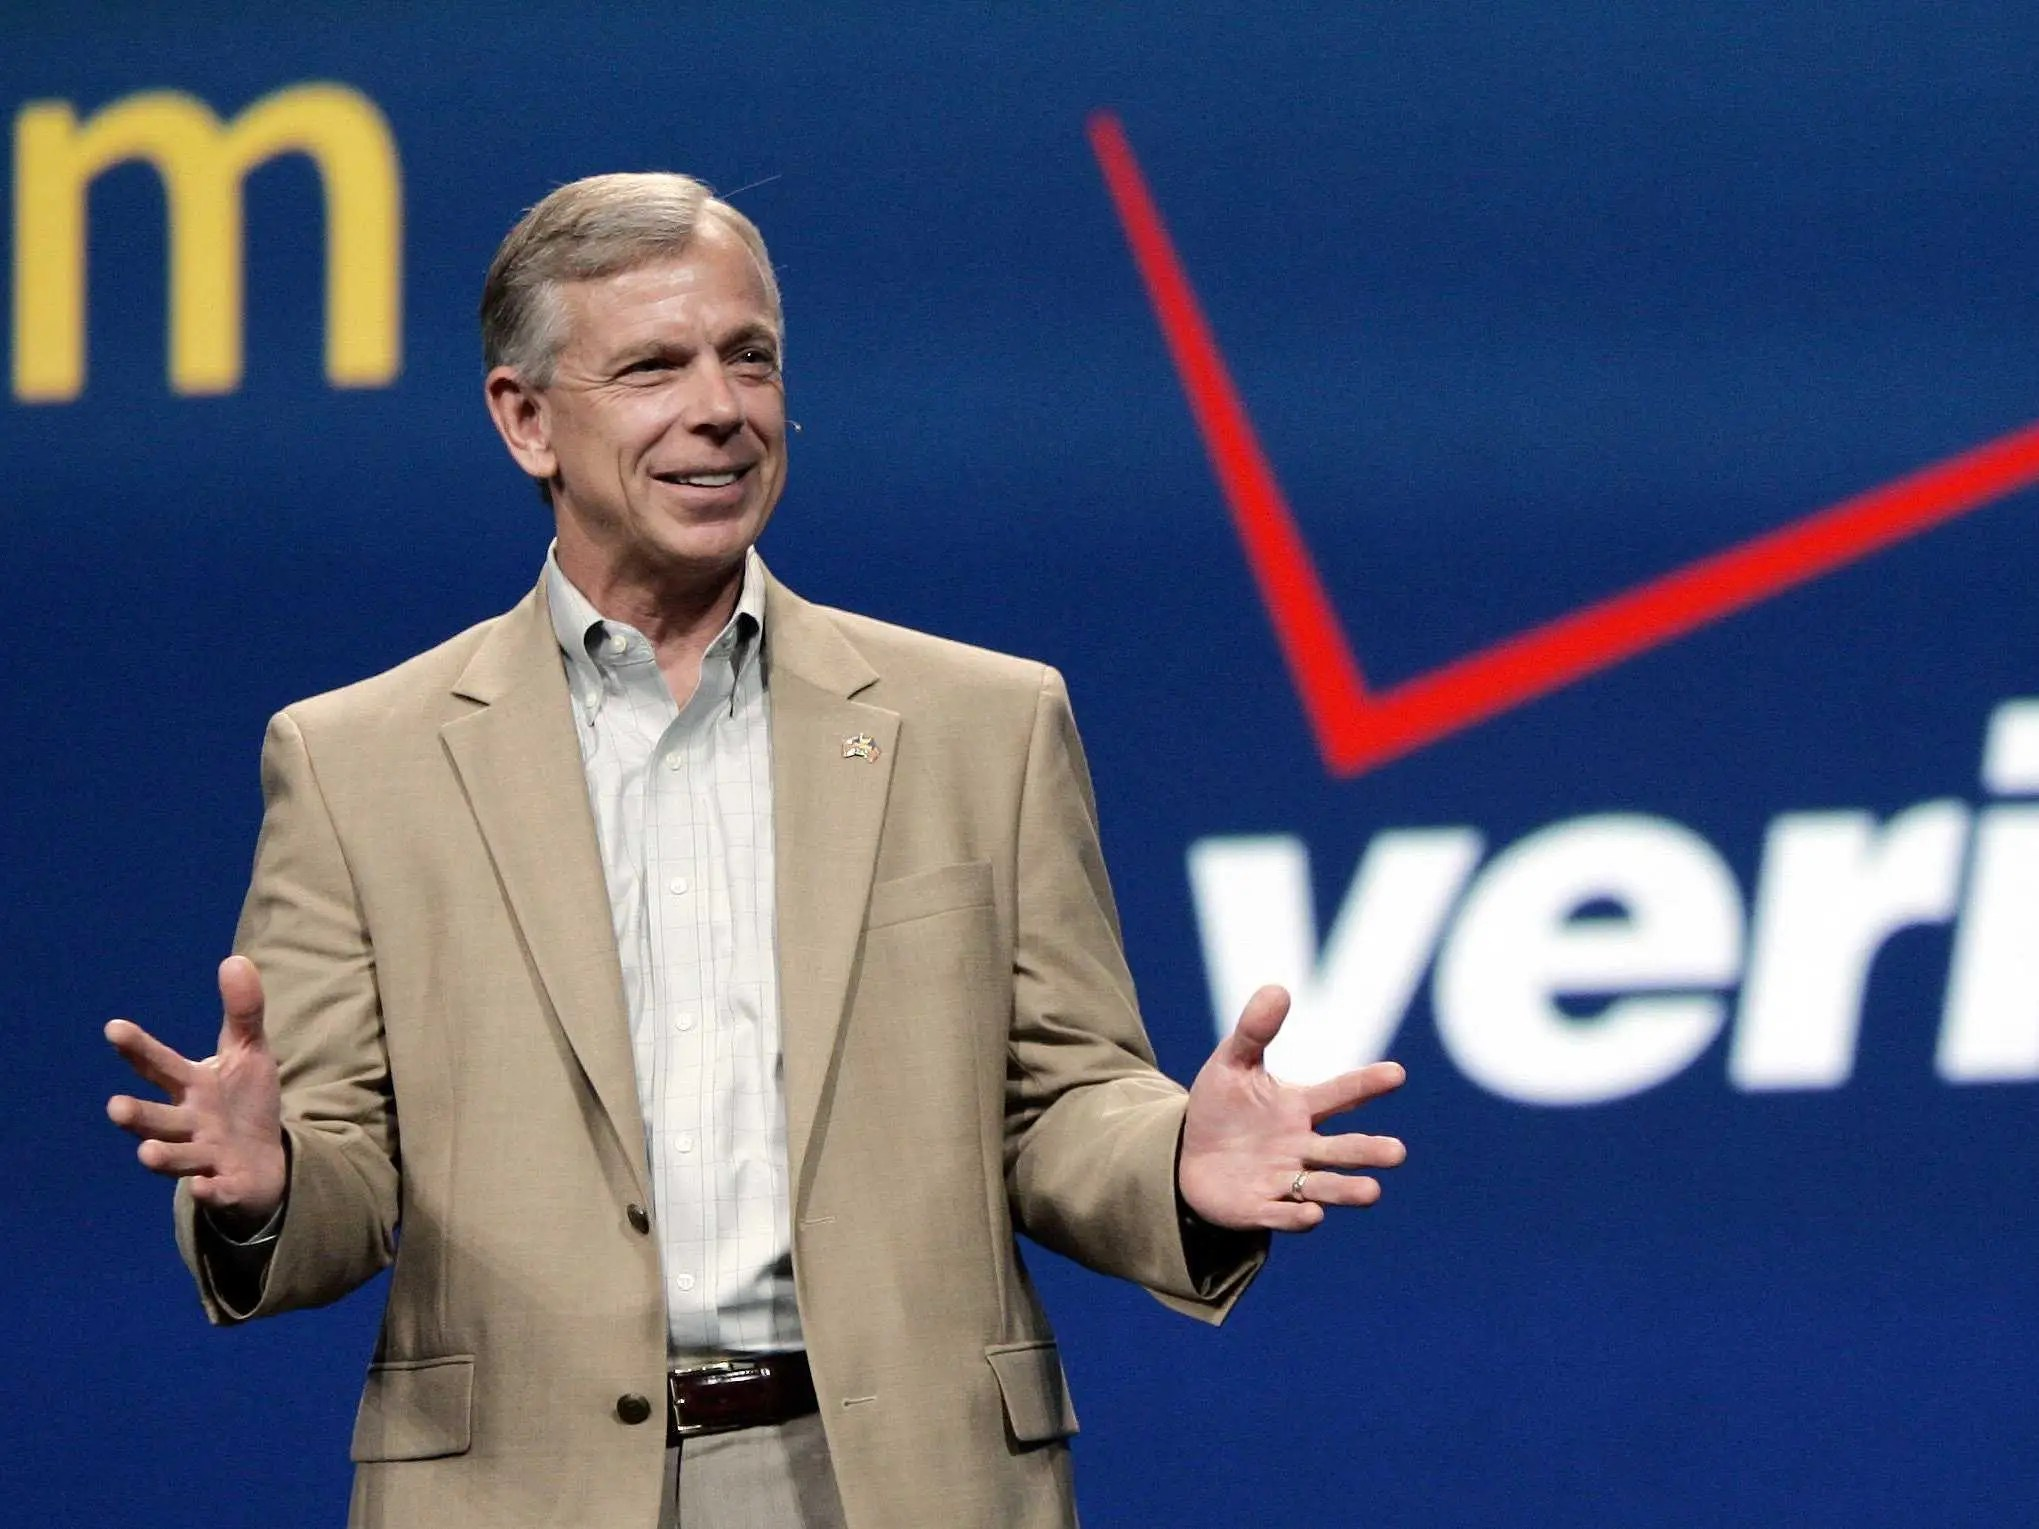 Verizon Communications' Lowell McAdam made $13.8 million in 2012.